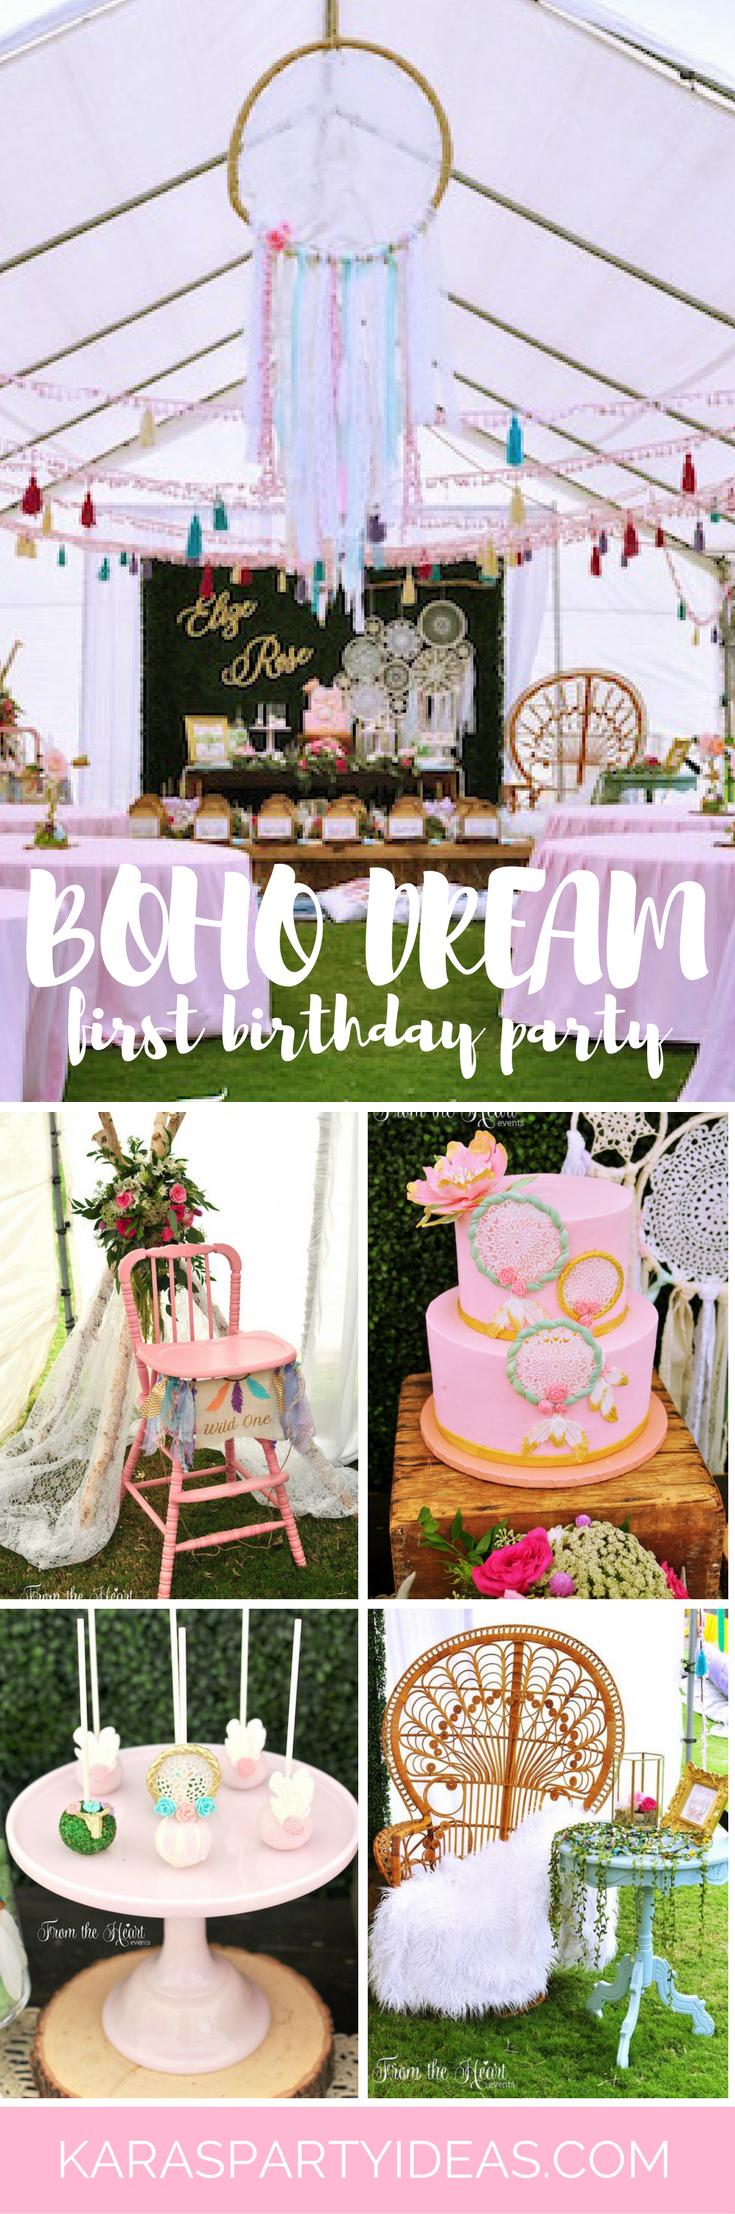 Boho Dream 1st Birthday Party via Kara's Party Ideas - KarasPartyIdeas.com